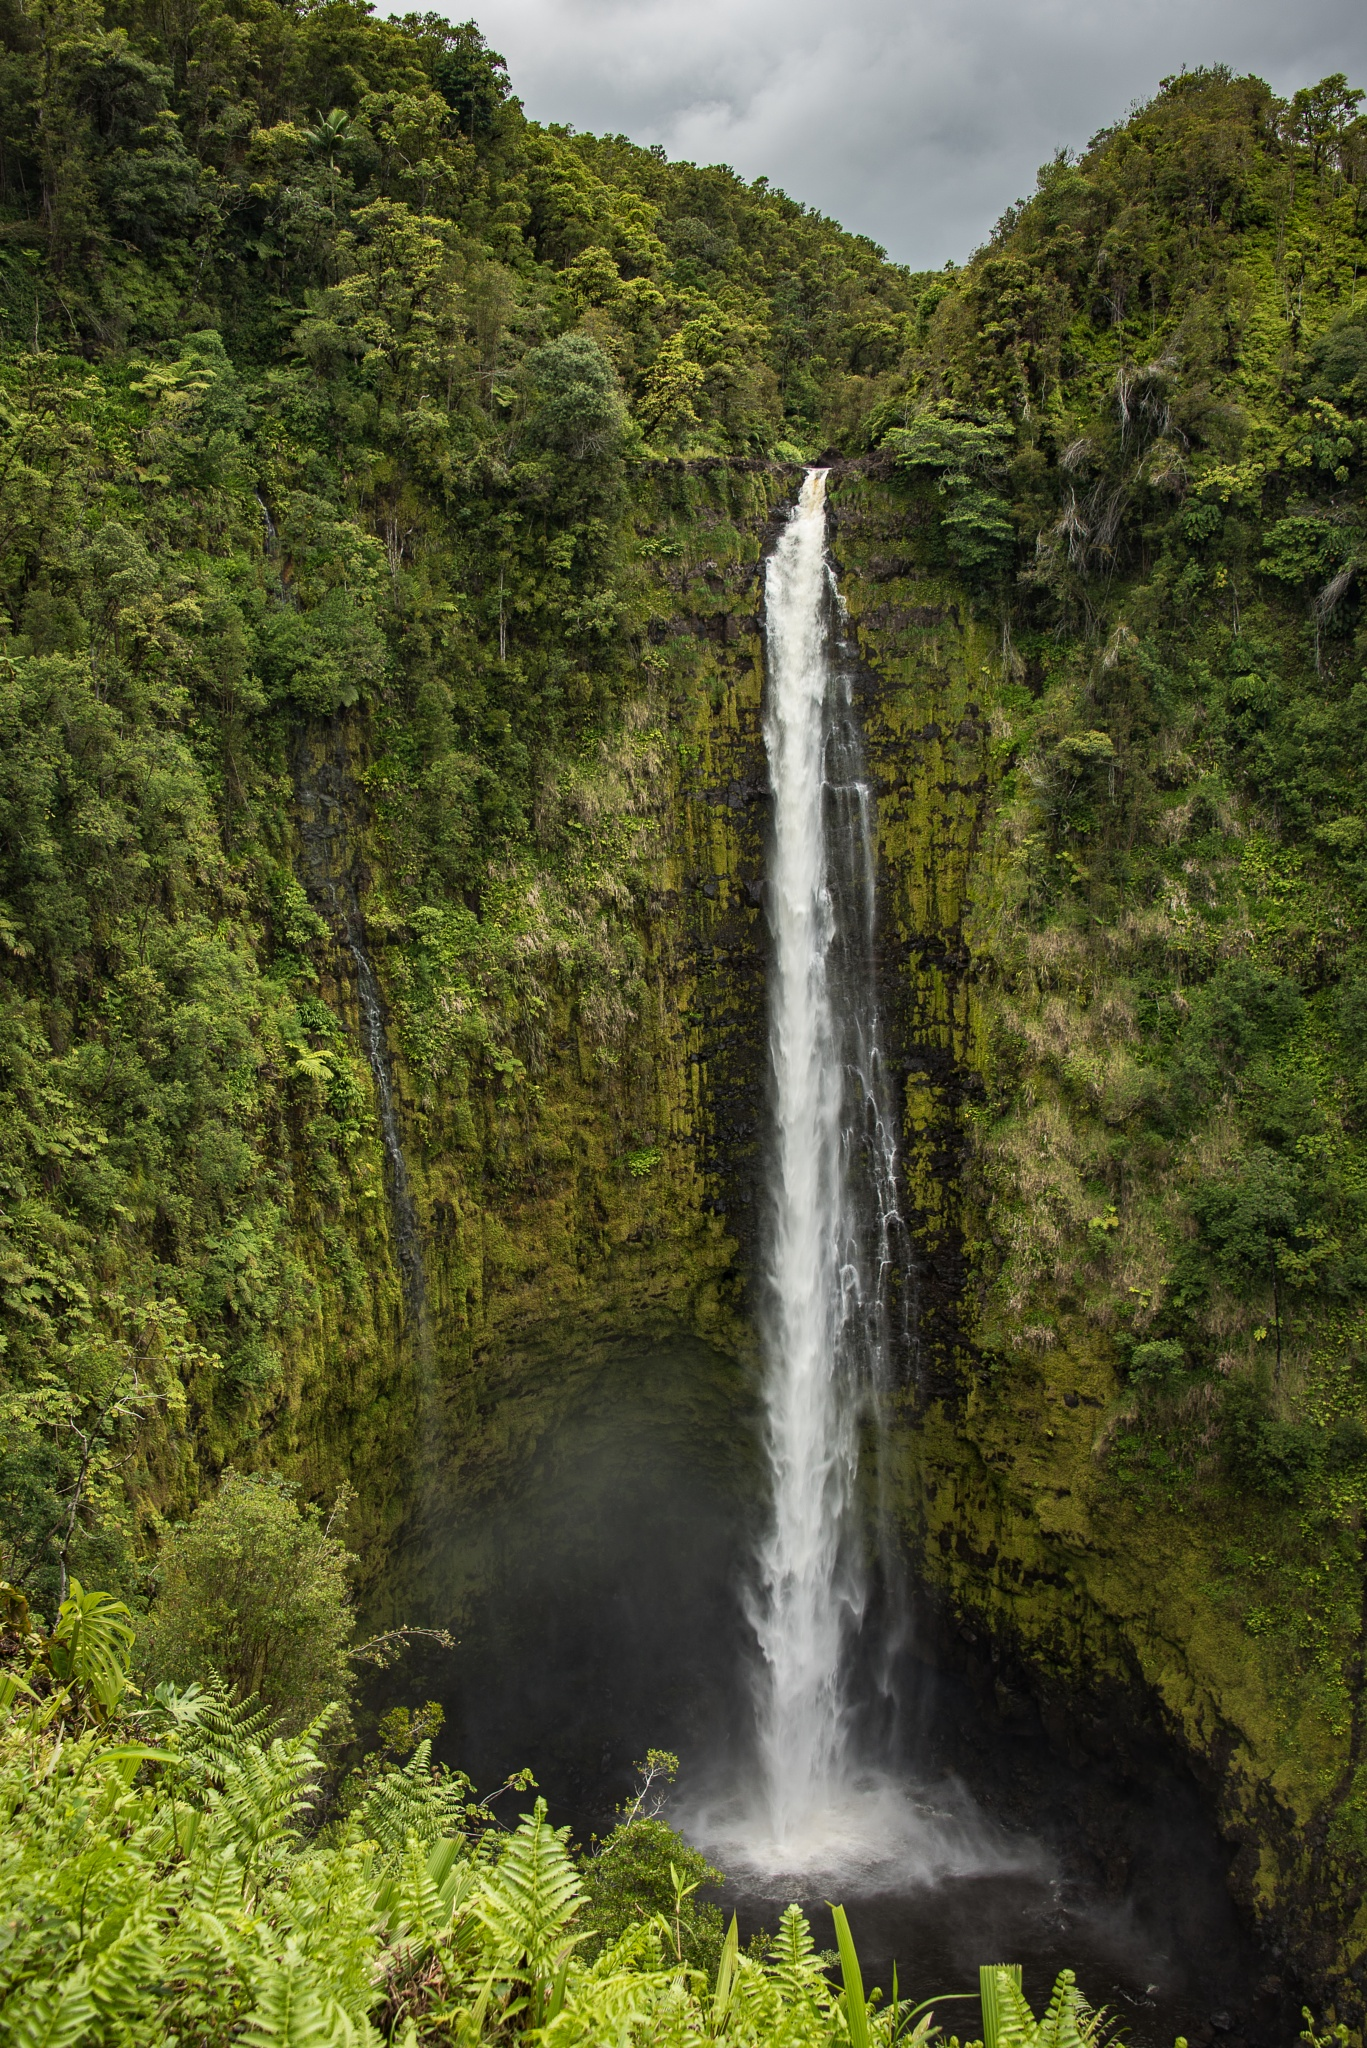 Hawaiian Waterfall by Steve Aicinena